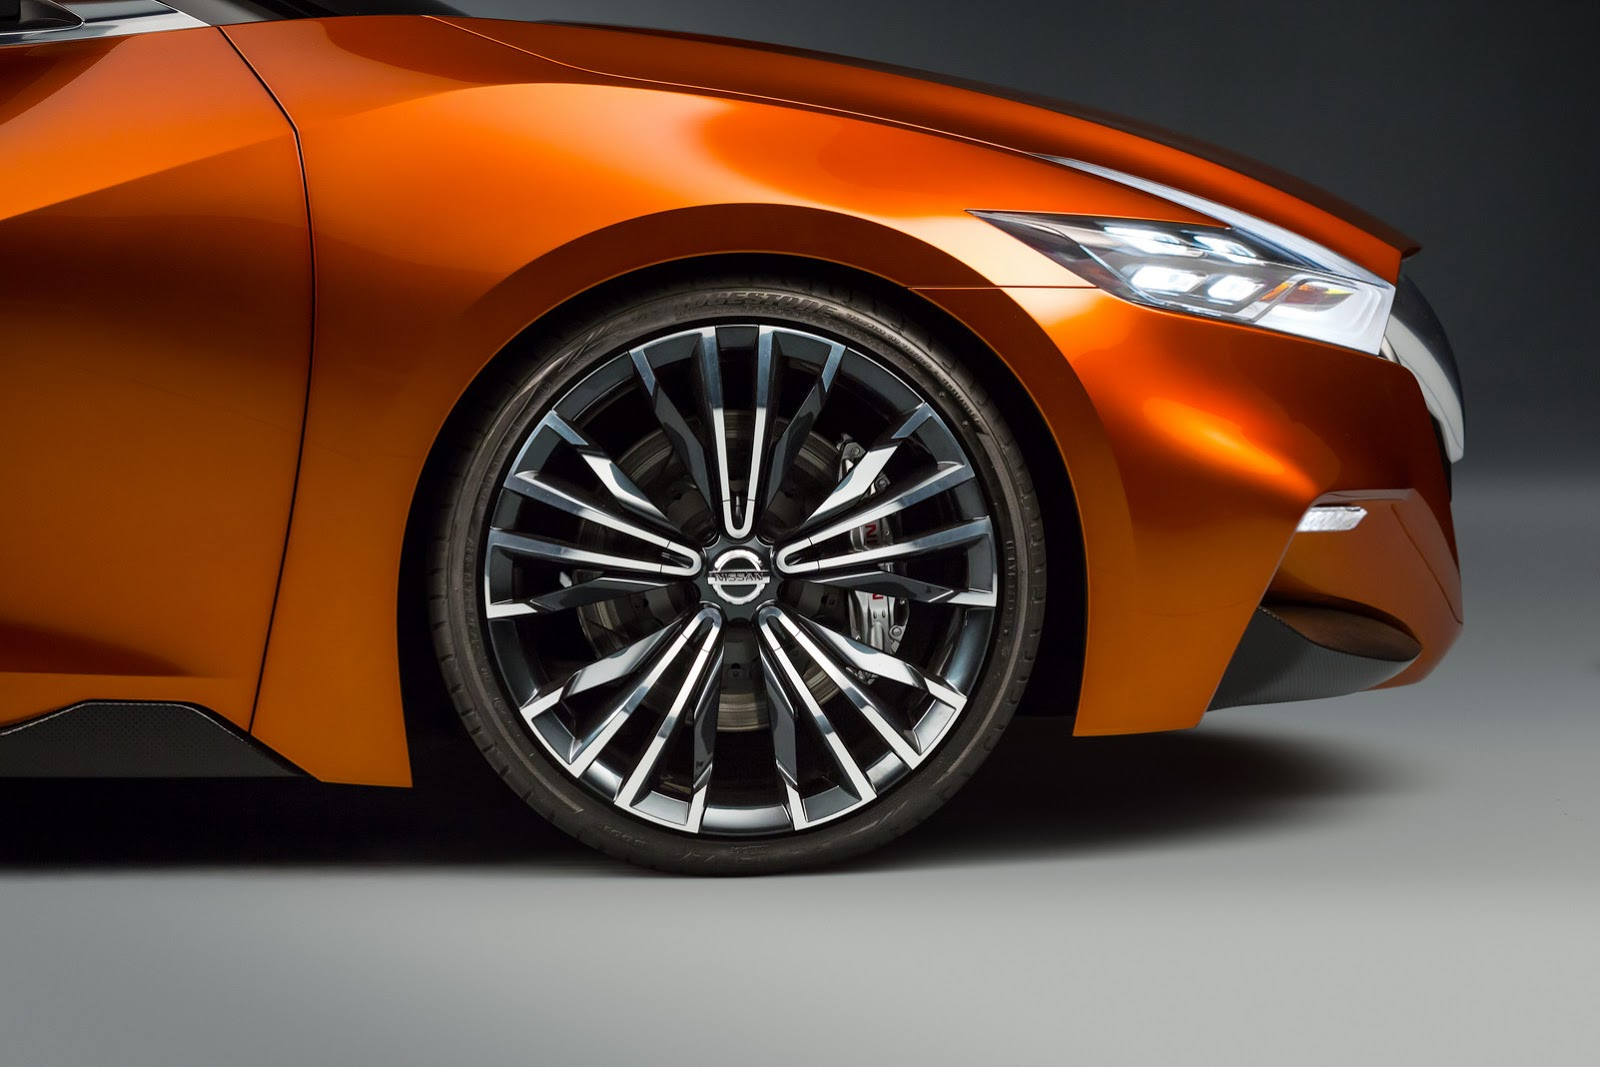 Nissan Cars - News: Sport Sedan Concept unveiled